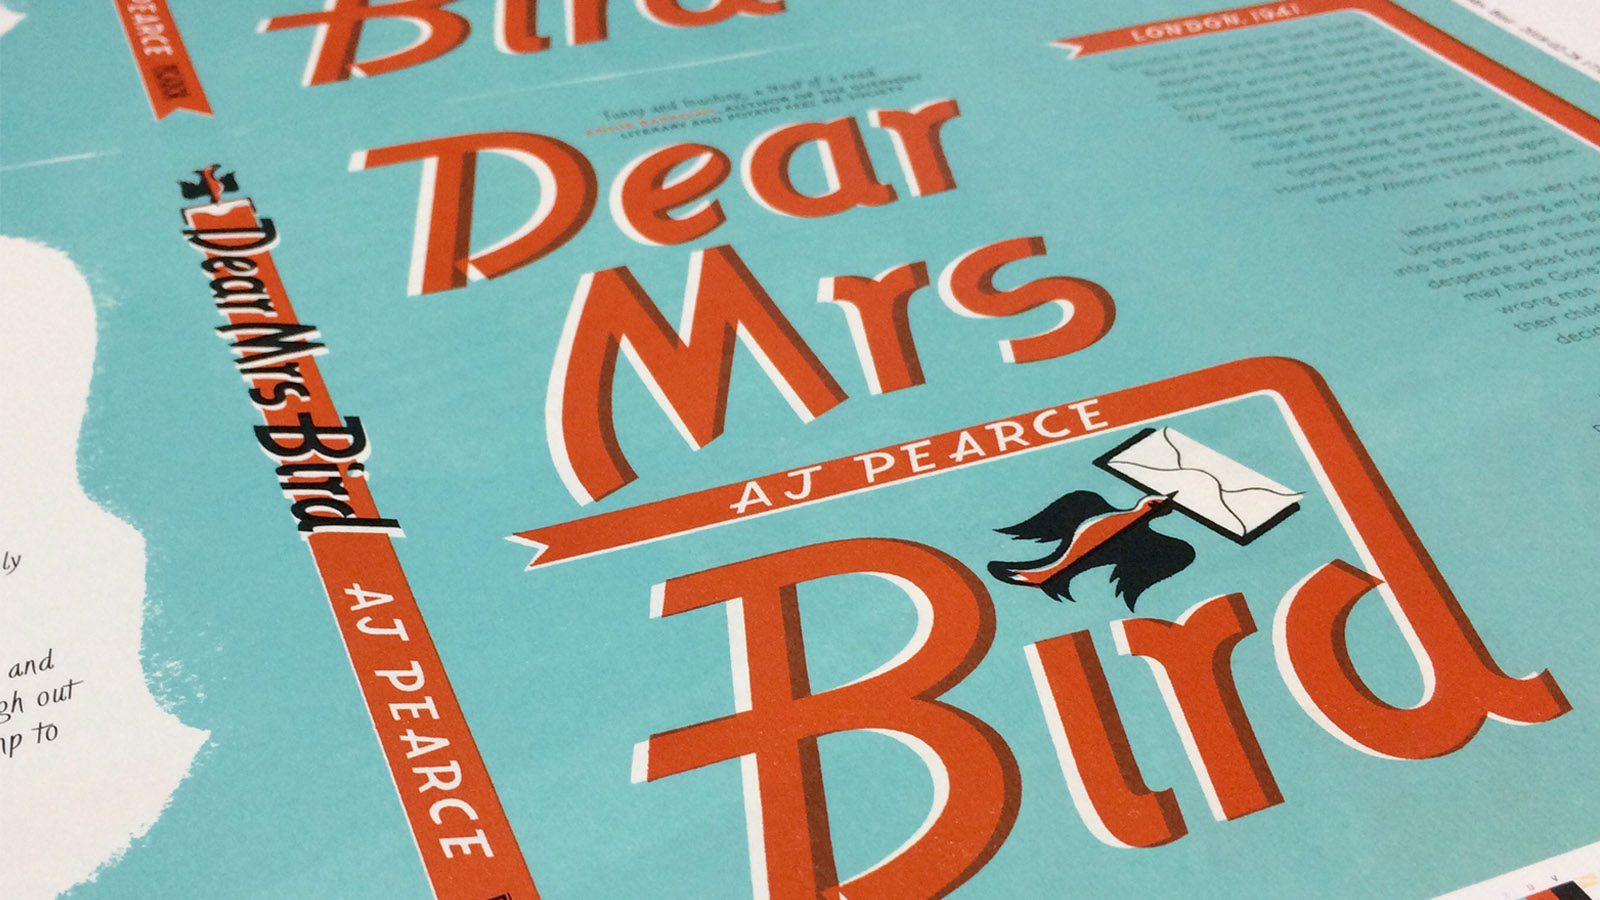 dear-mrs-bird-aj-pearce.jpg